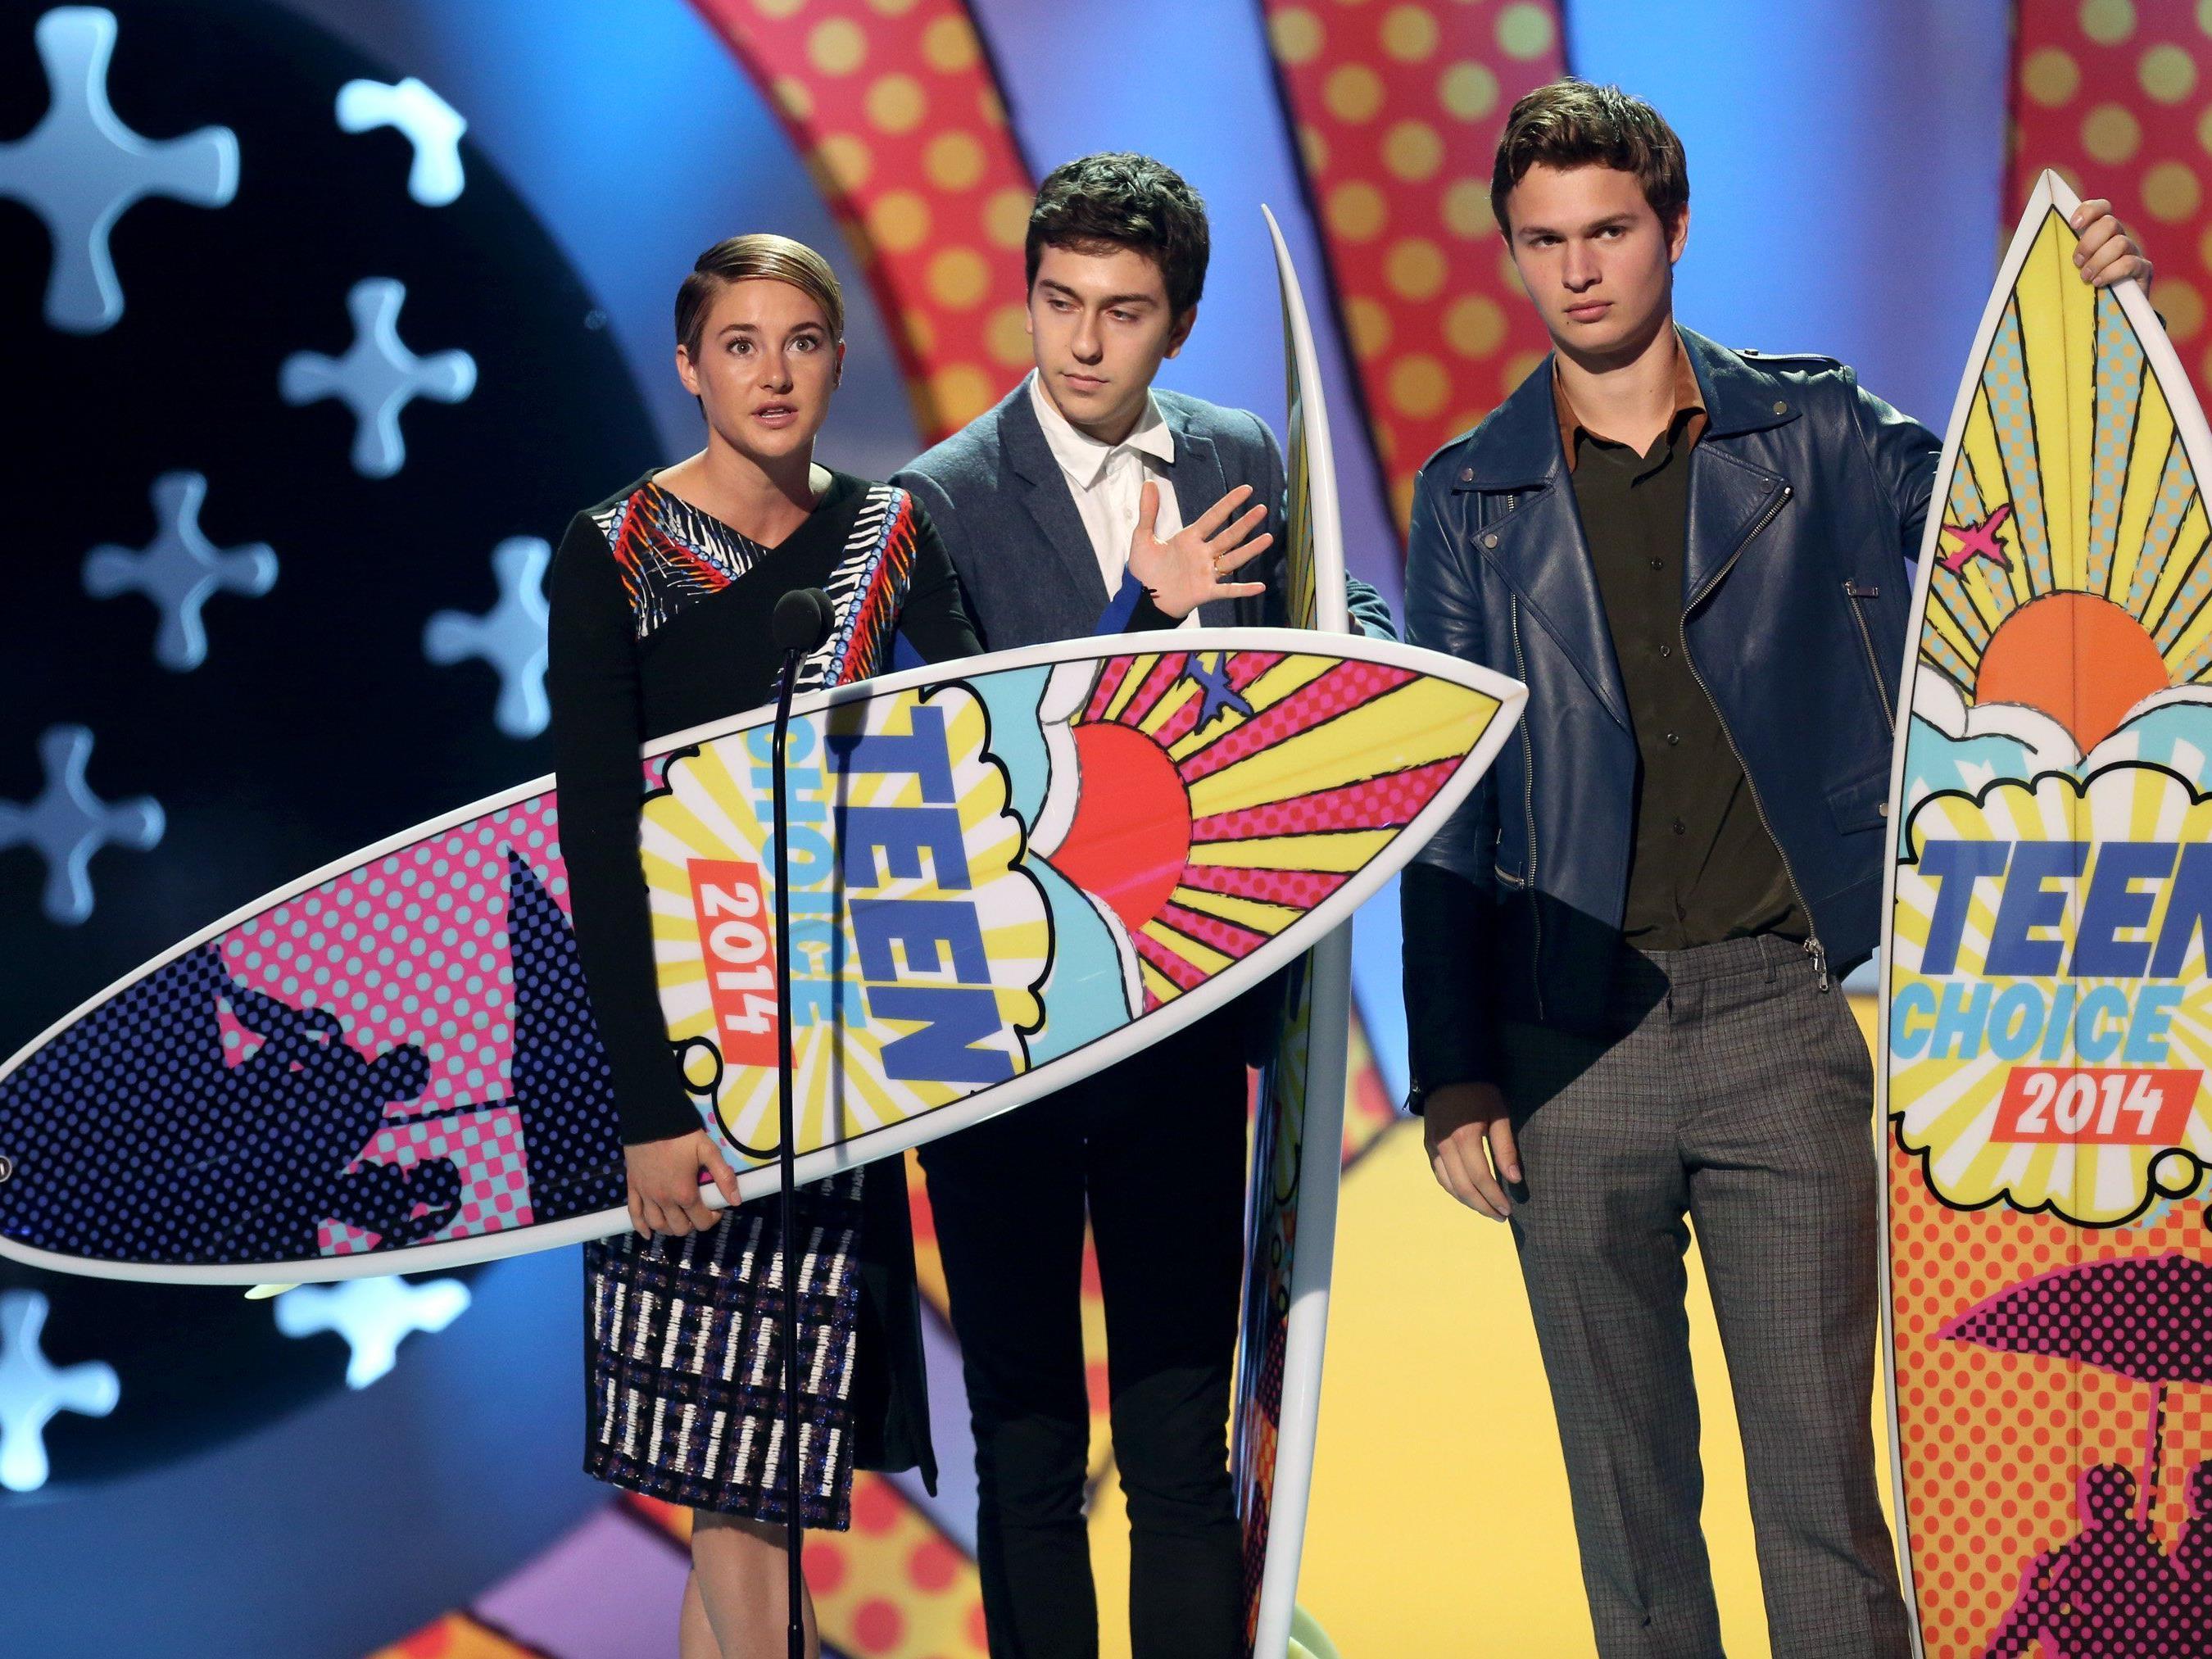 Shailene Woodley, Nat Wolff und Ansel Elgort räumten bei den Teen Choise Awards ab.